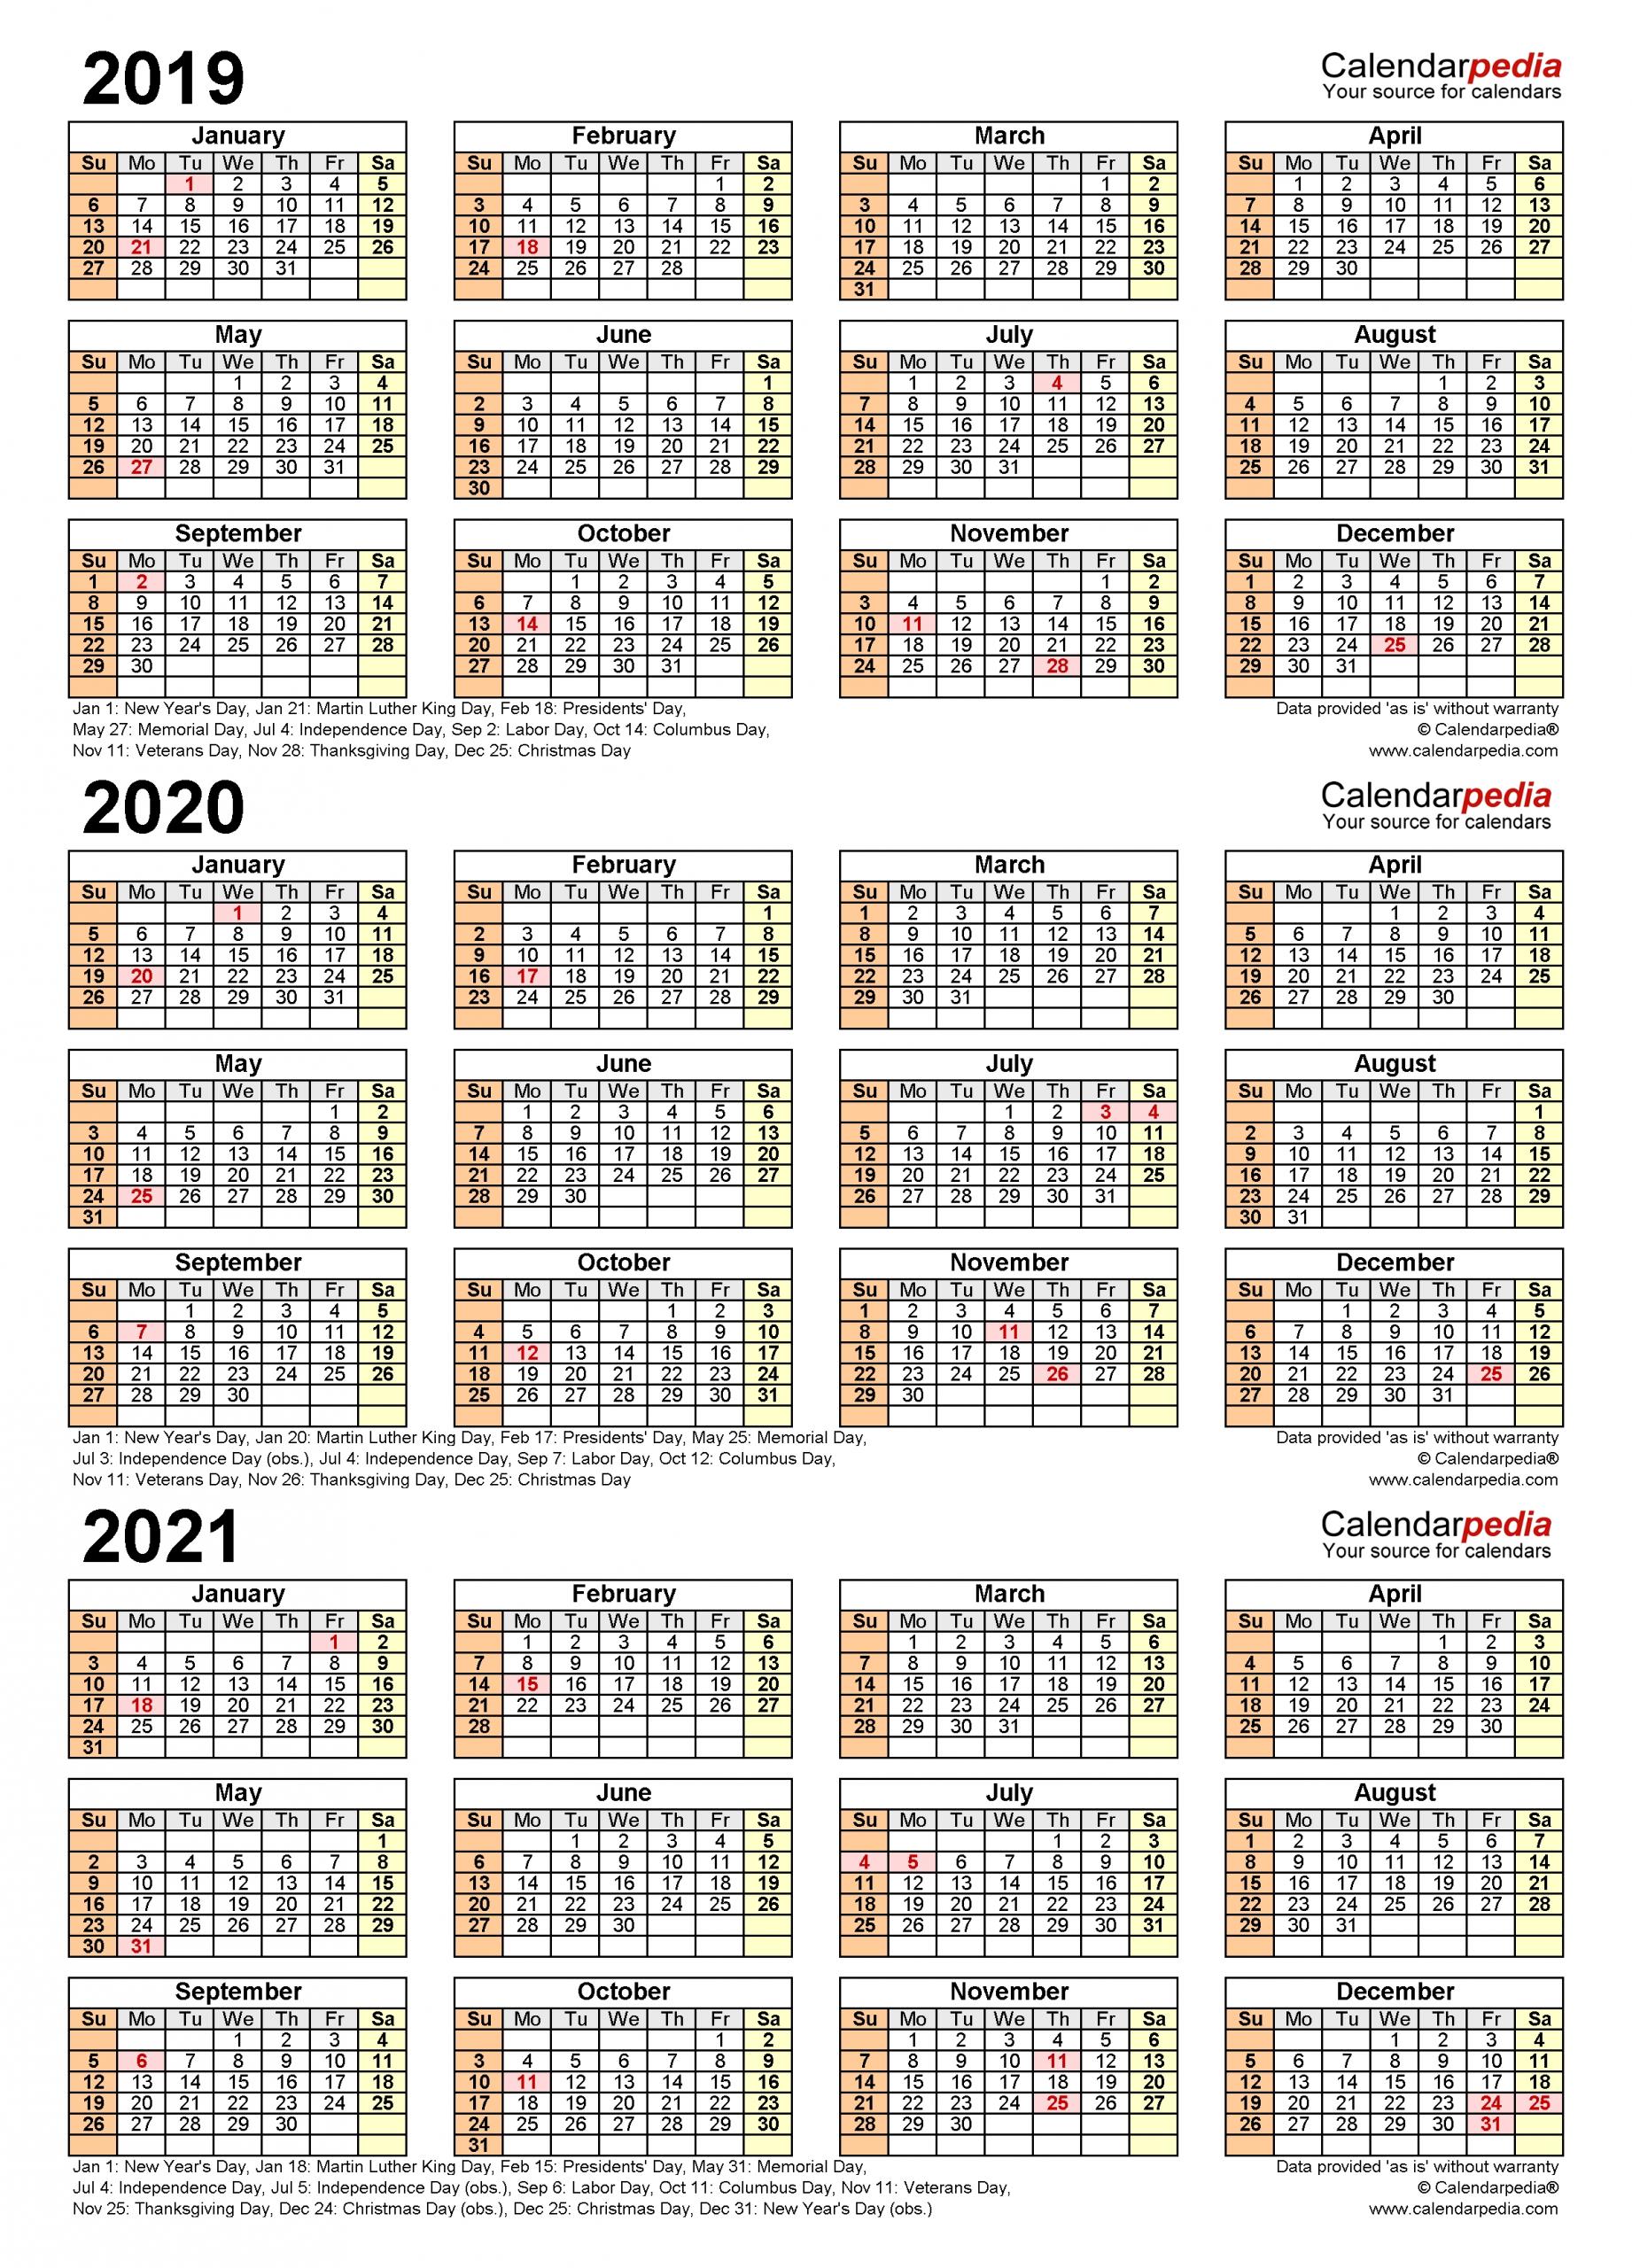 2019-2021 Three Year Calendar - Free Printable Pdf Templates in Fiscal Year Calendar 2020 Printable Bangla